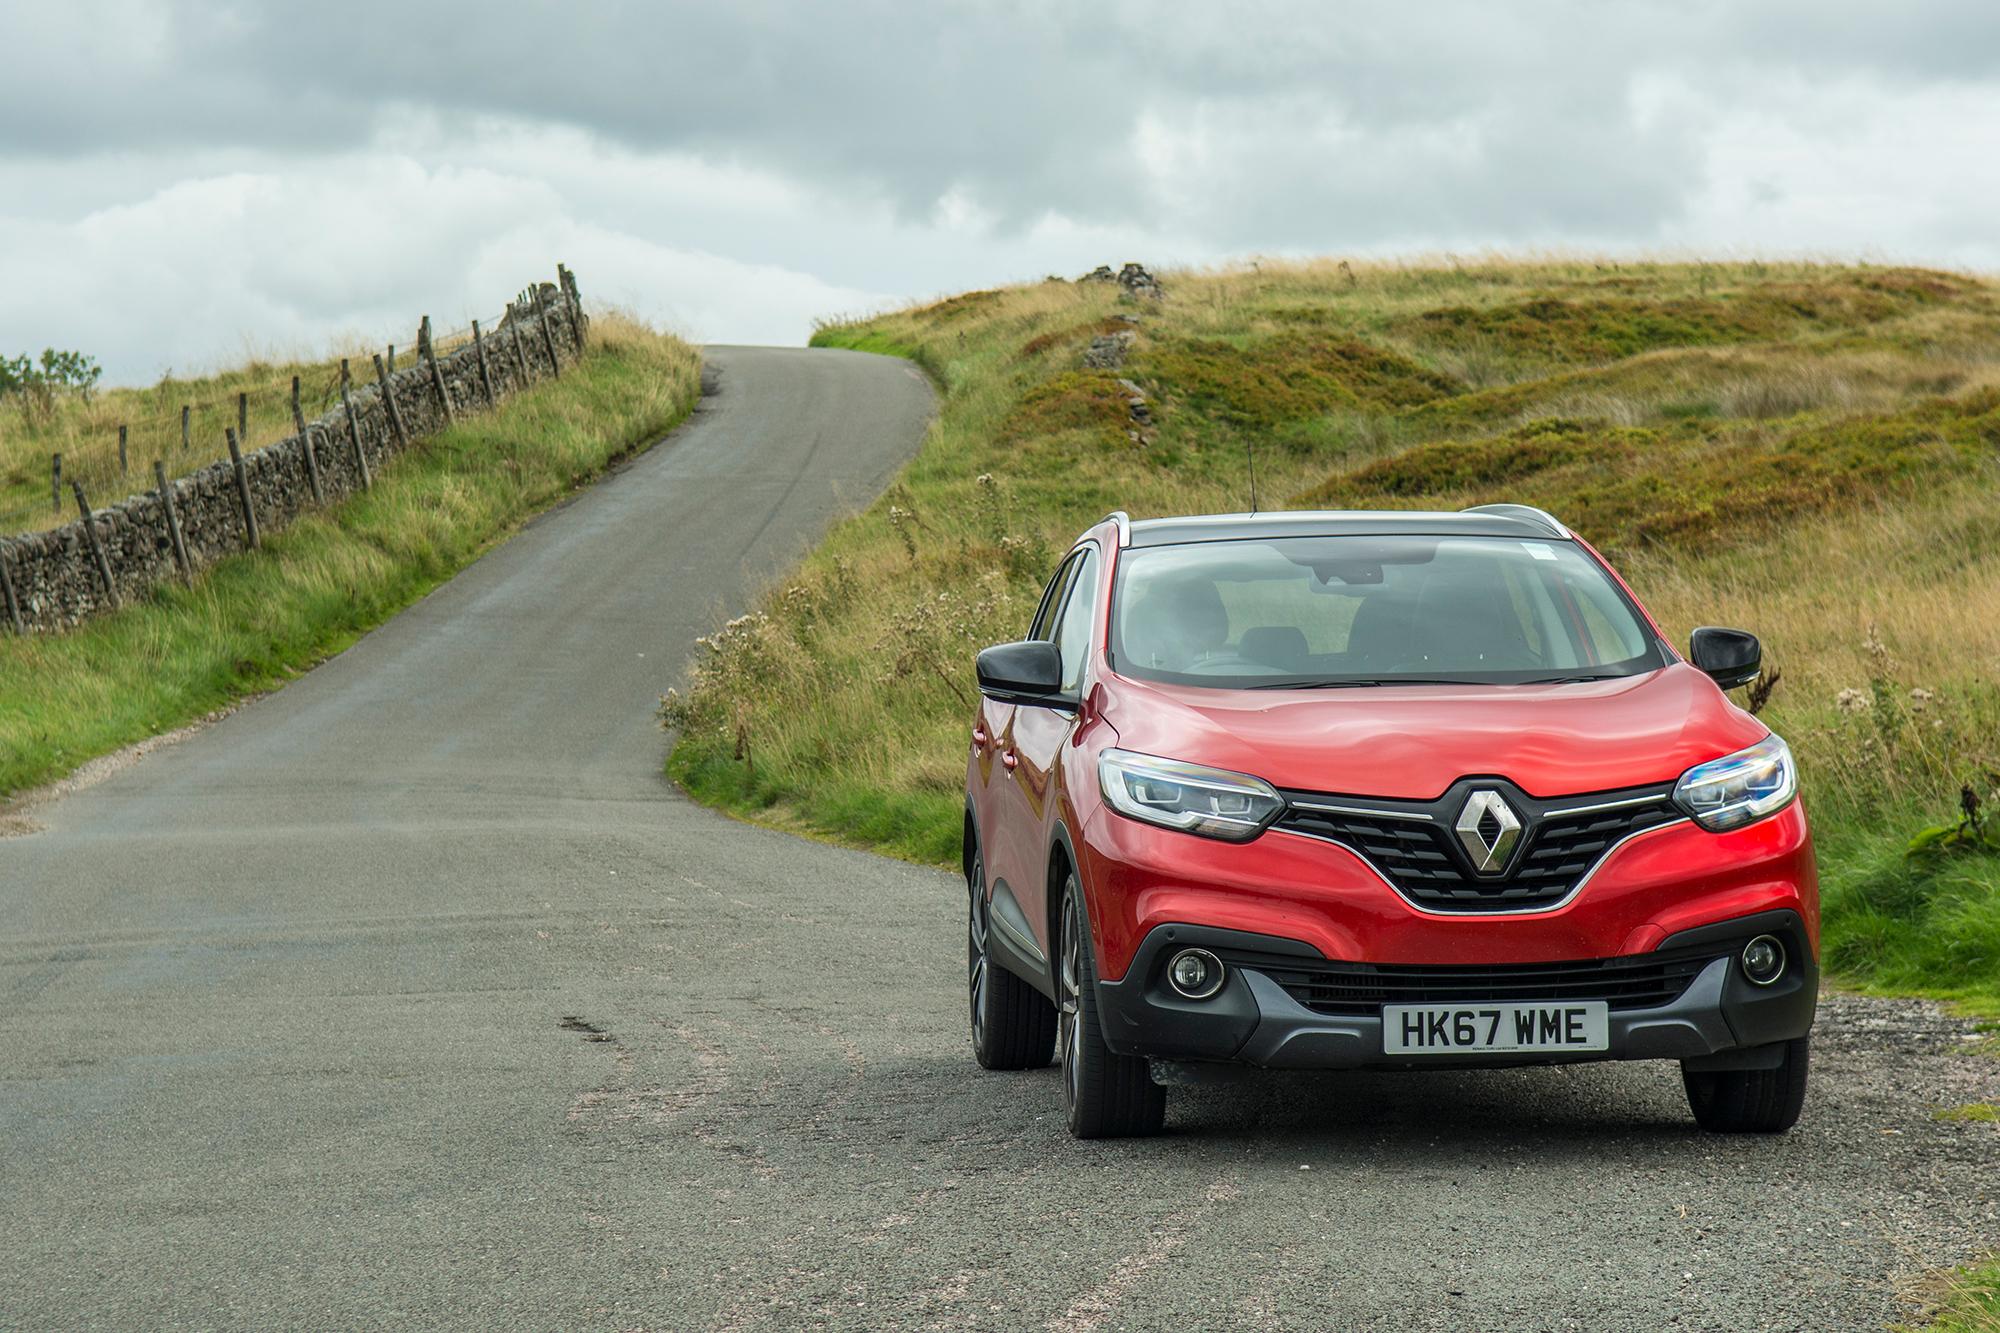 Renault Kadjar. (Image: Willy Barton/Shutterstock)